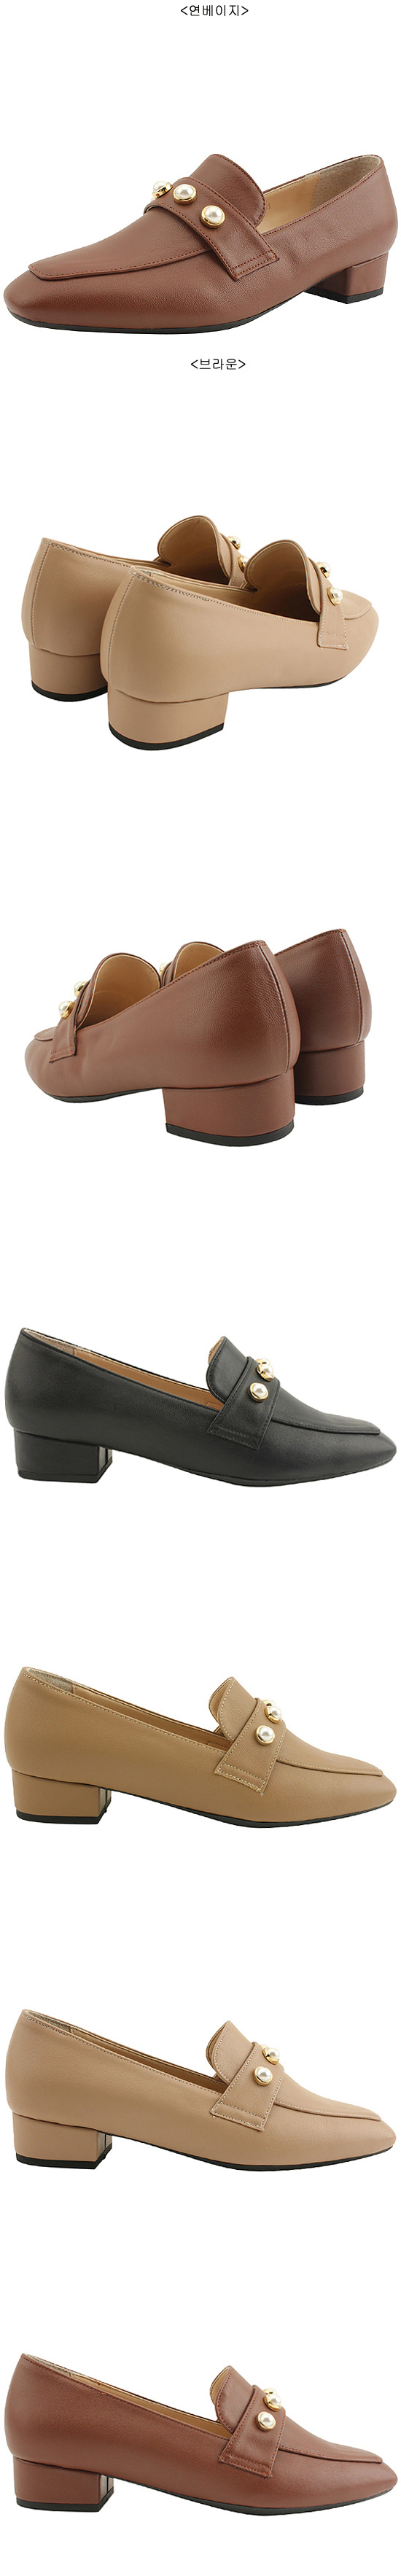 Pearl strap low heel loafers black